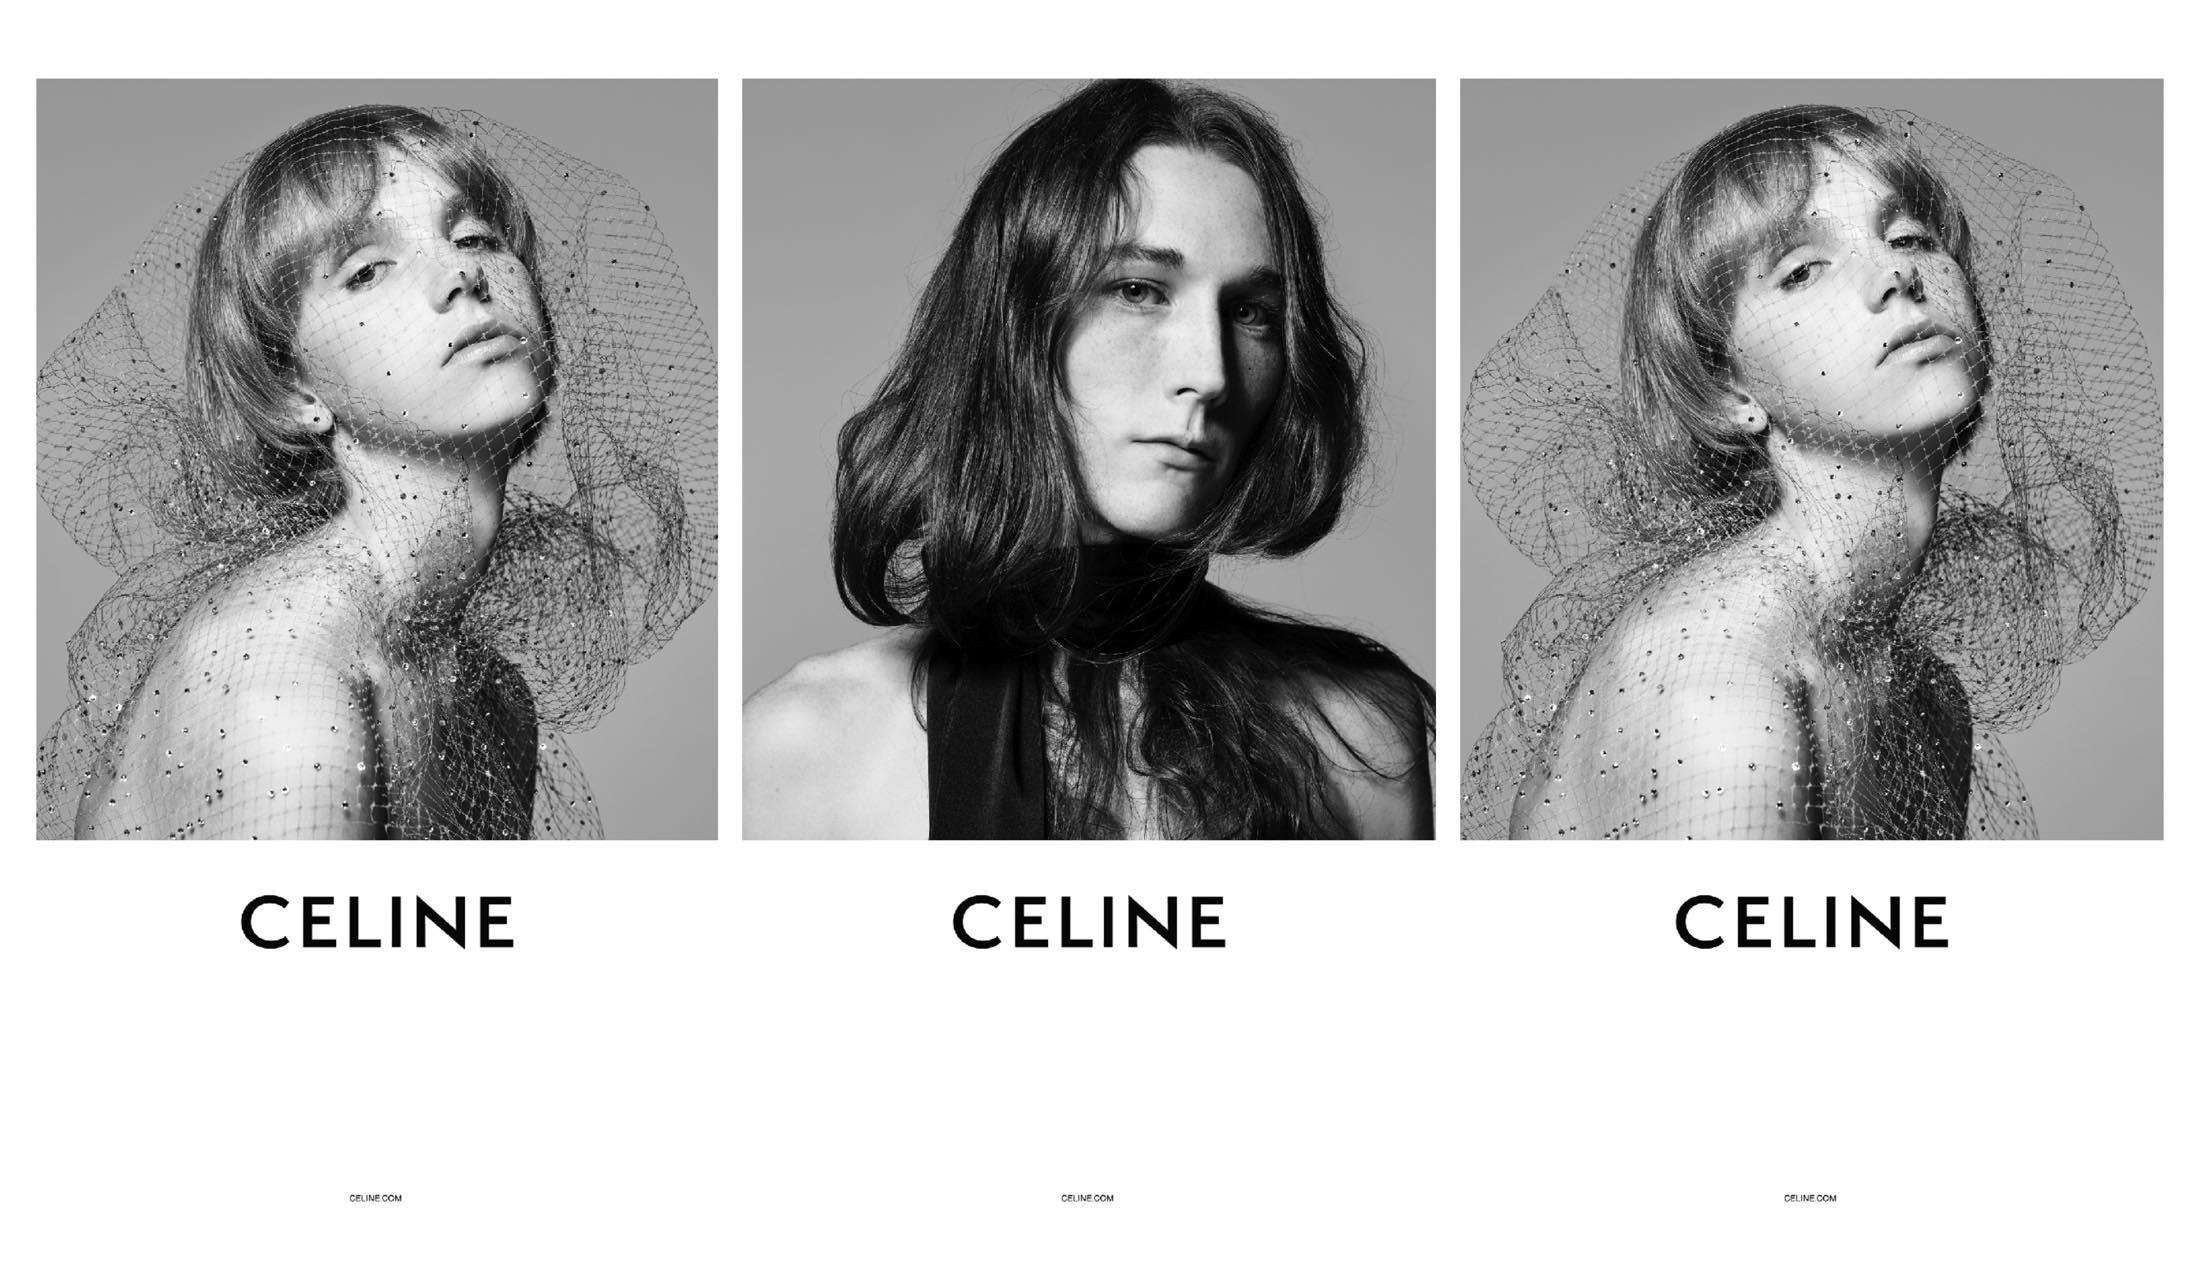 CELINE(セリーヌ)によるキャンペンビジュアルの画像